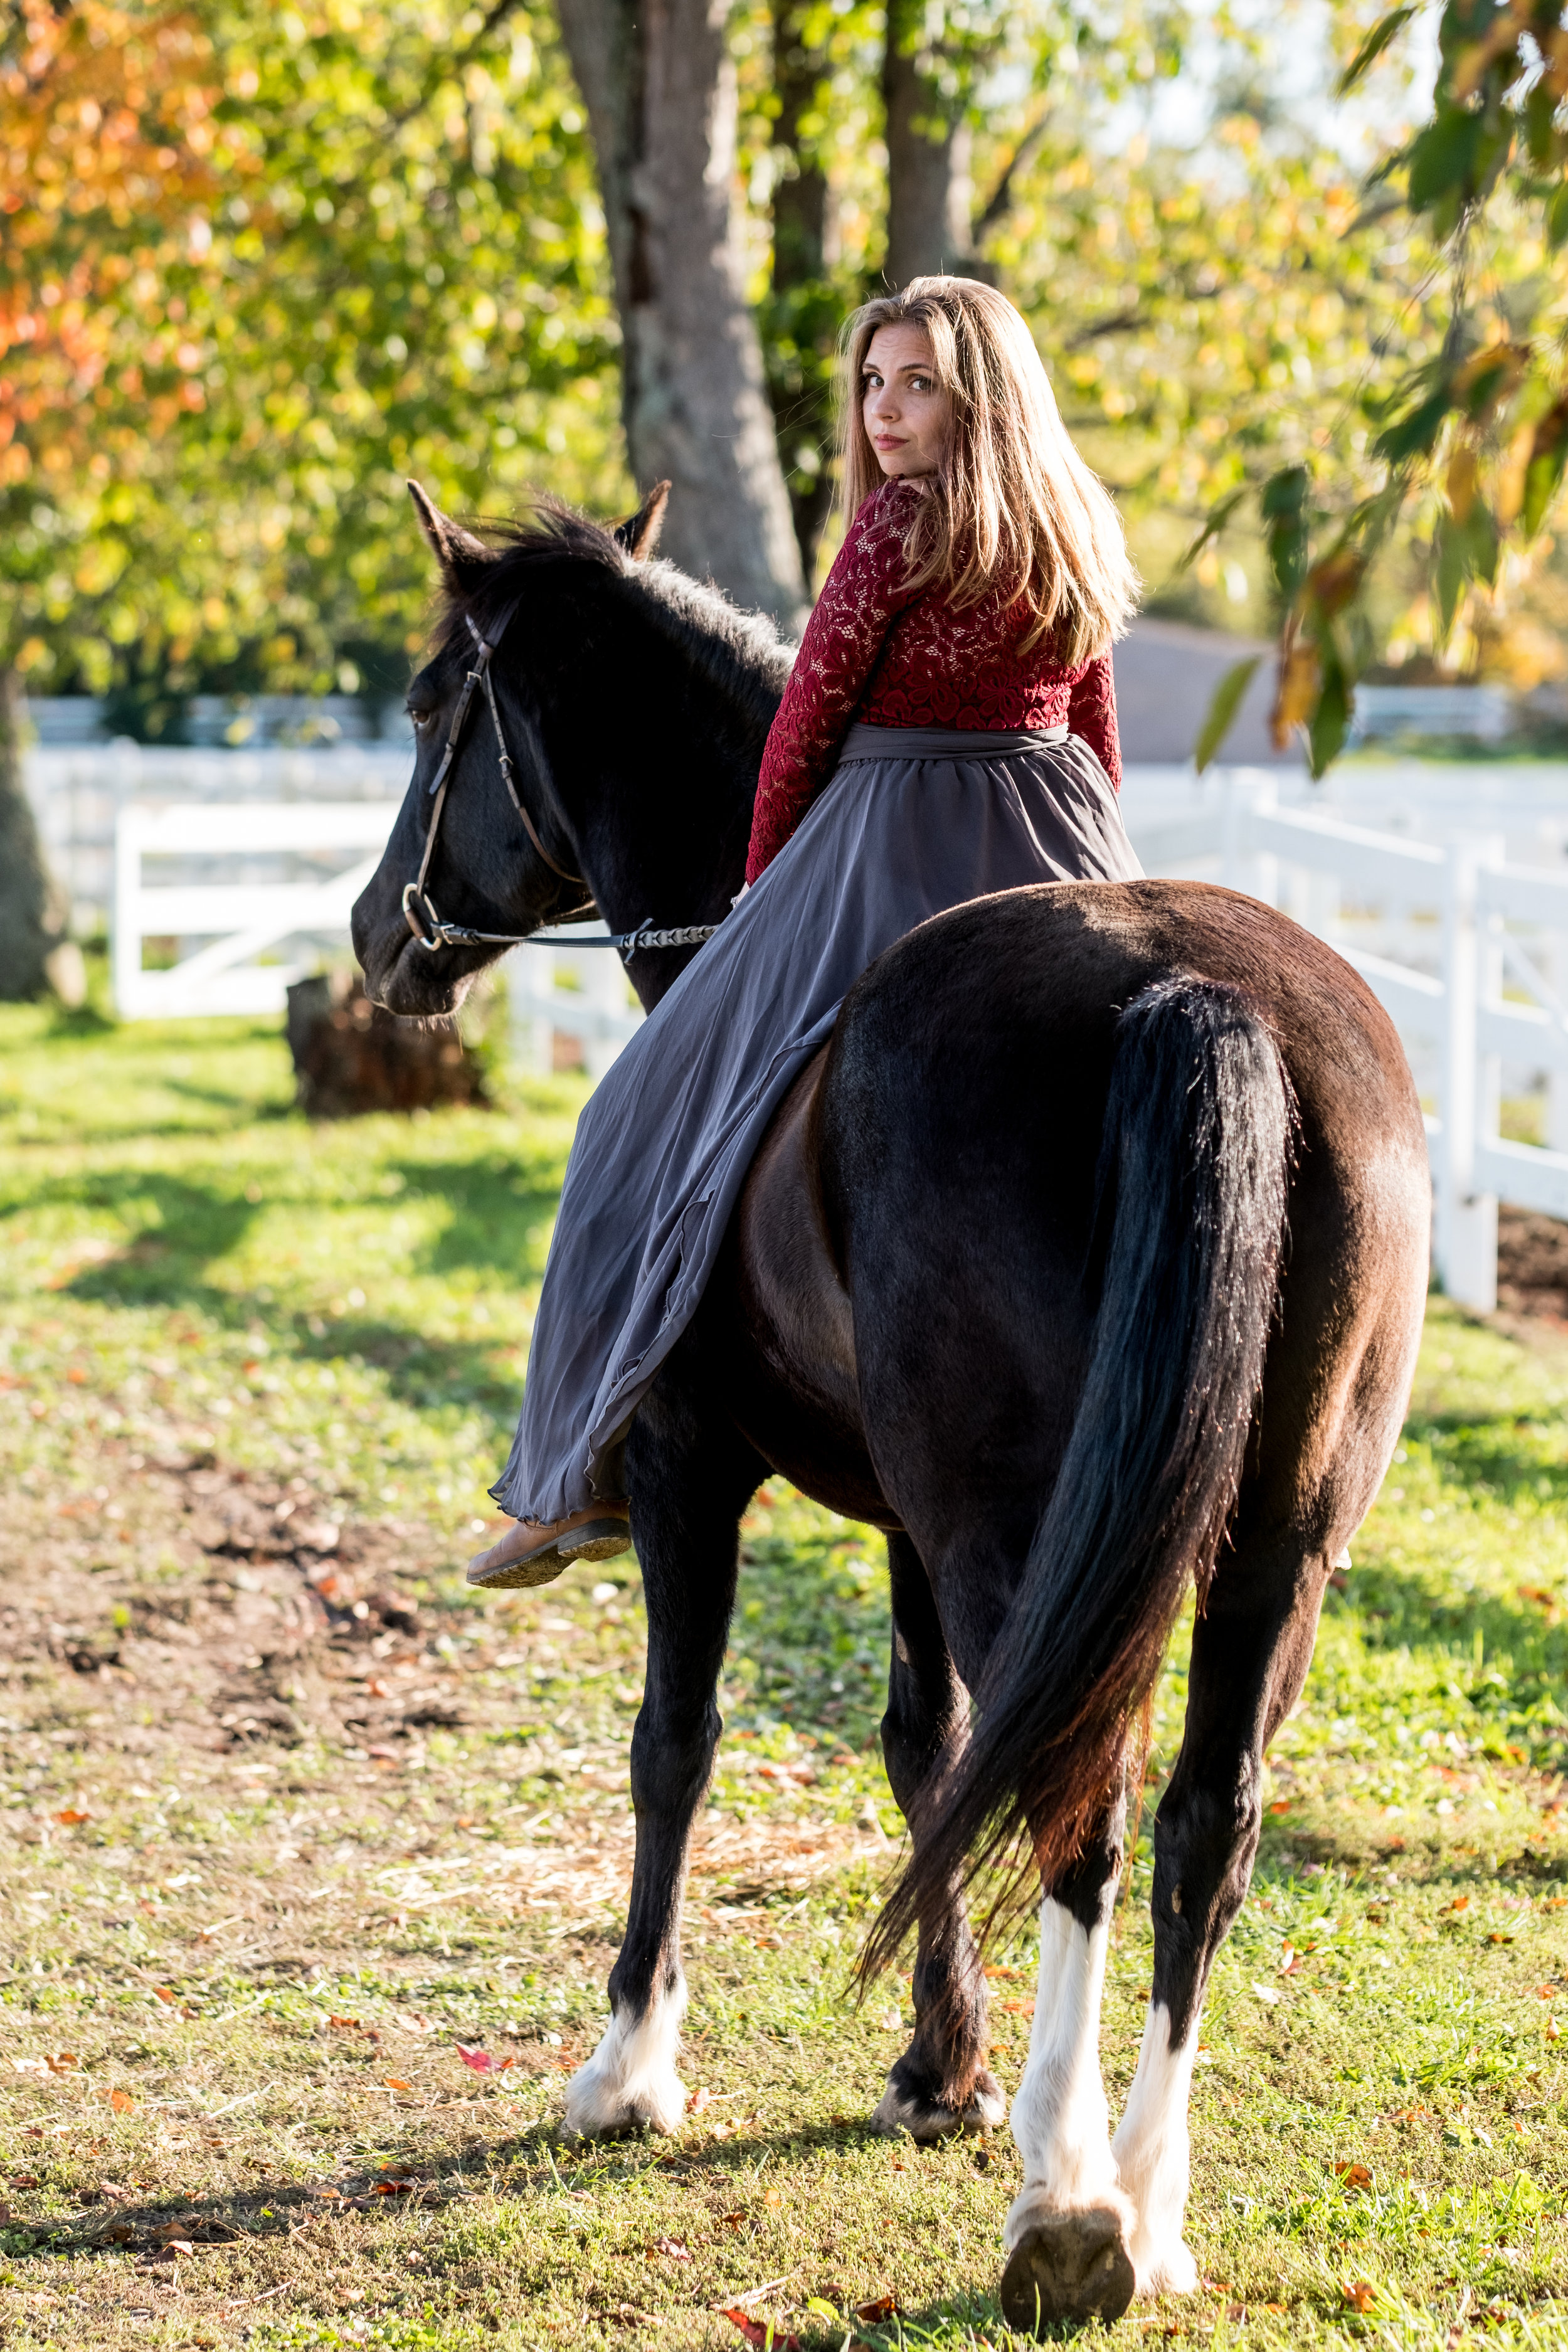 Michigan equestrian photographer